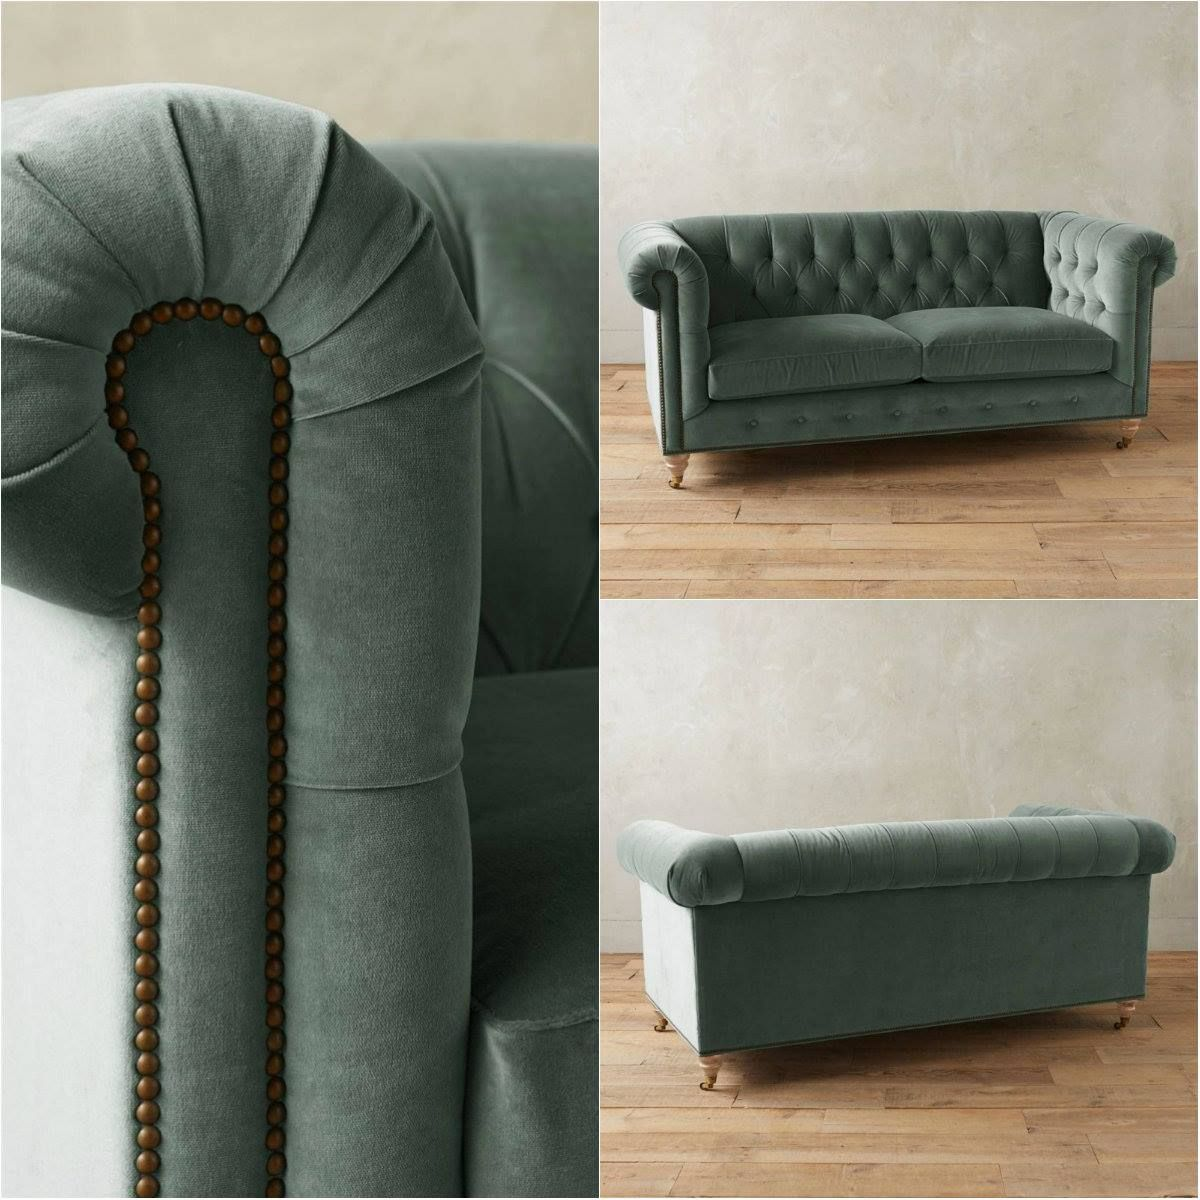 Dreipunkt Designer Leather Sofa Mustard Yellow Two Seat: Sage Green Tufted Velvet Chesterfield Sofa!